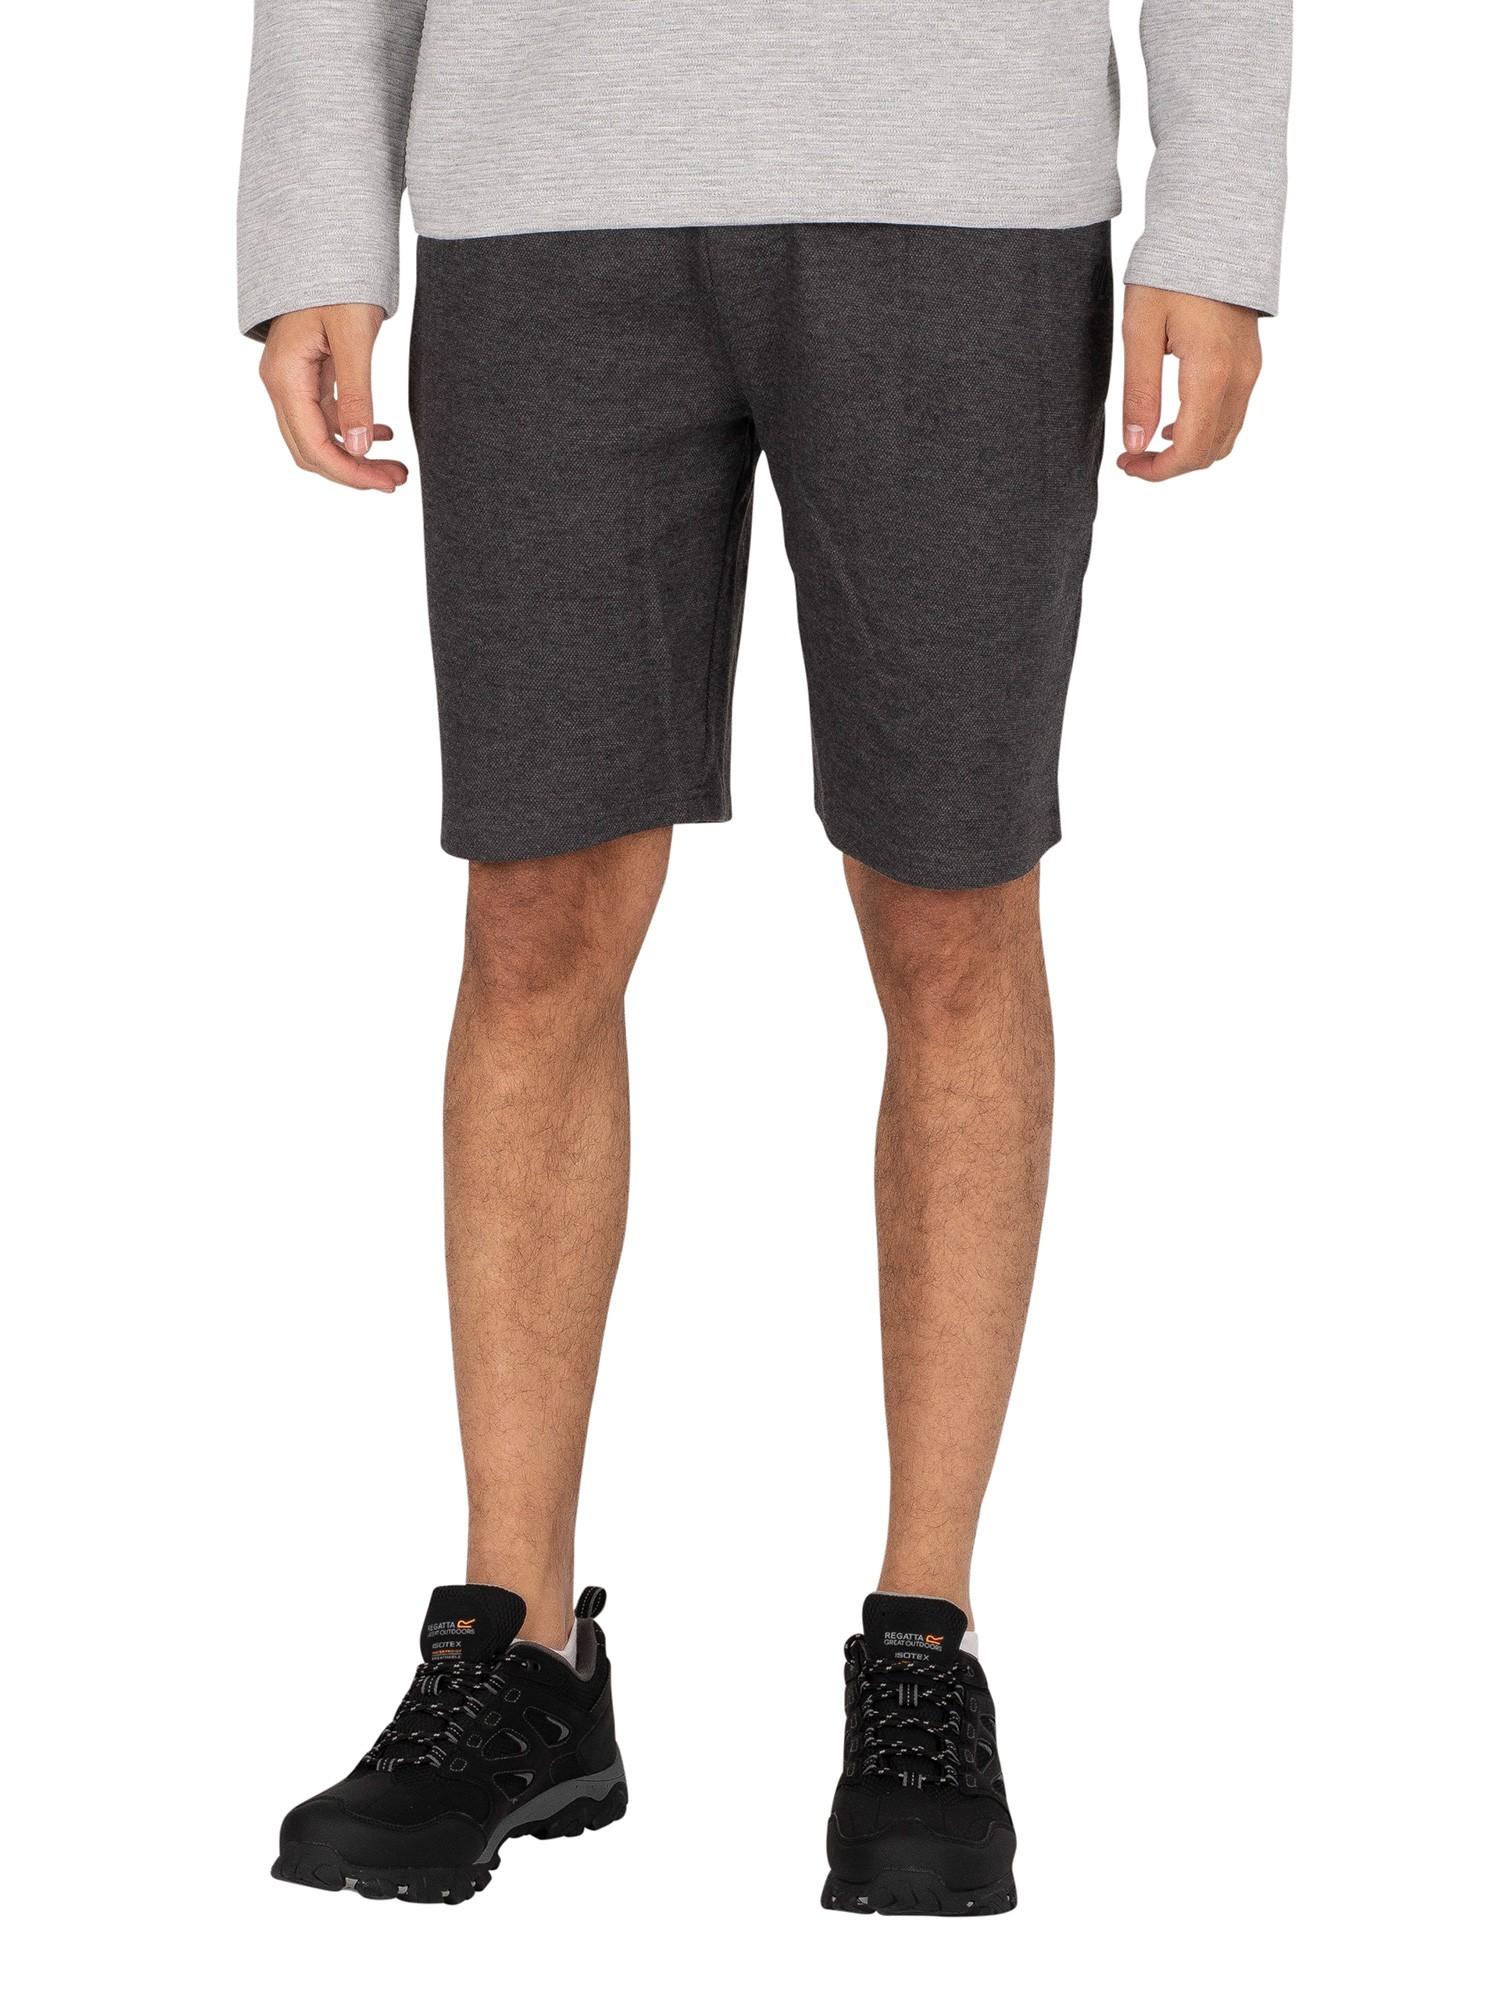 Continual Sweat Shorts